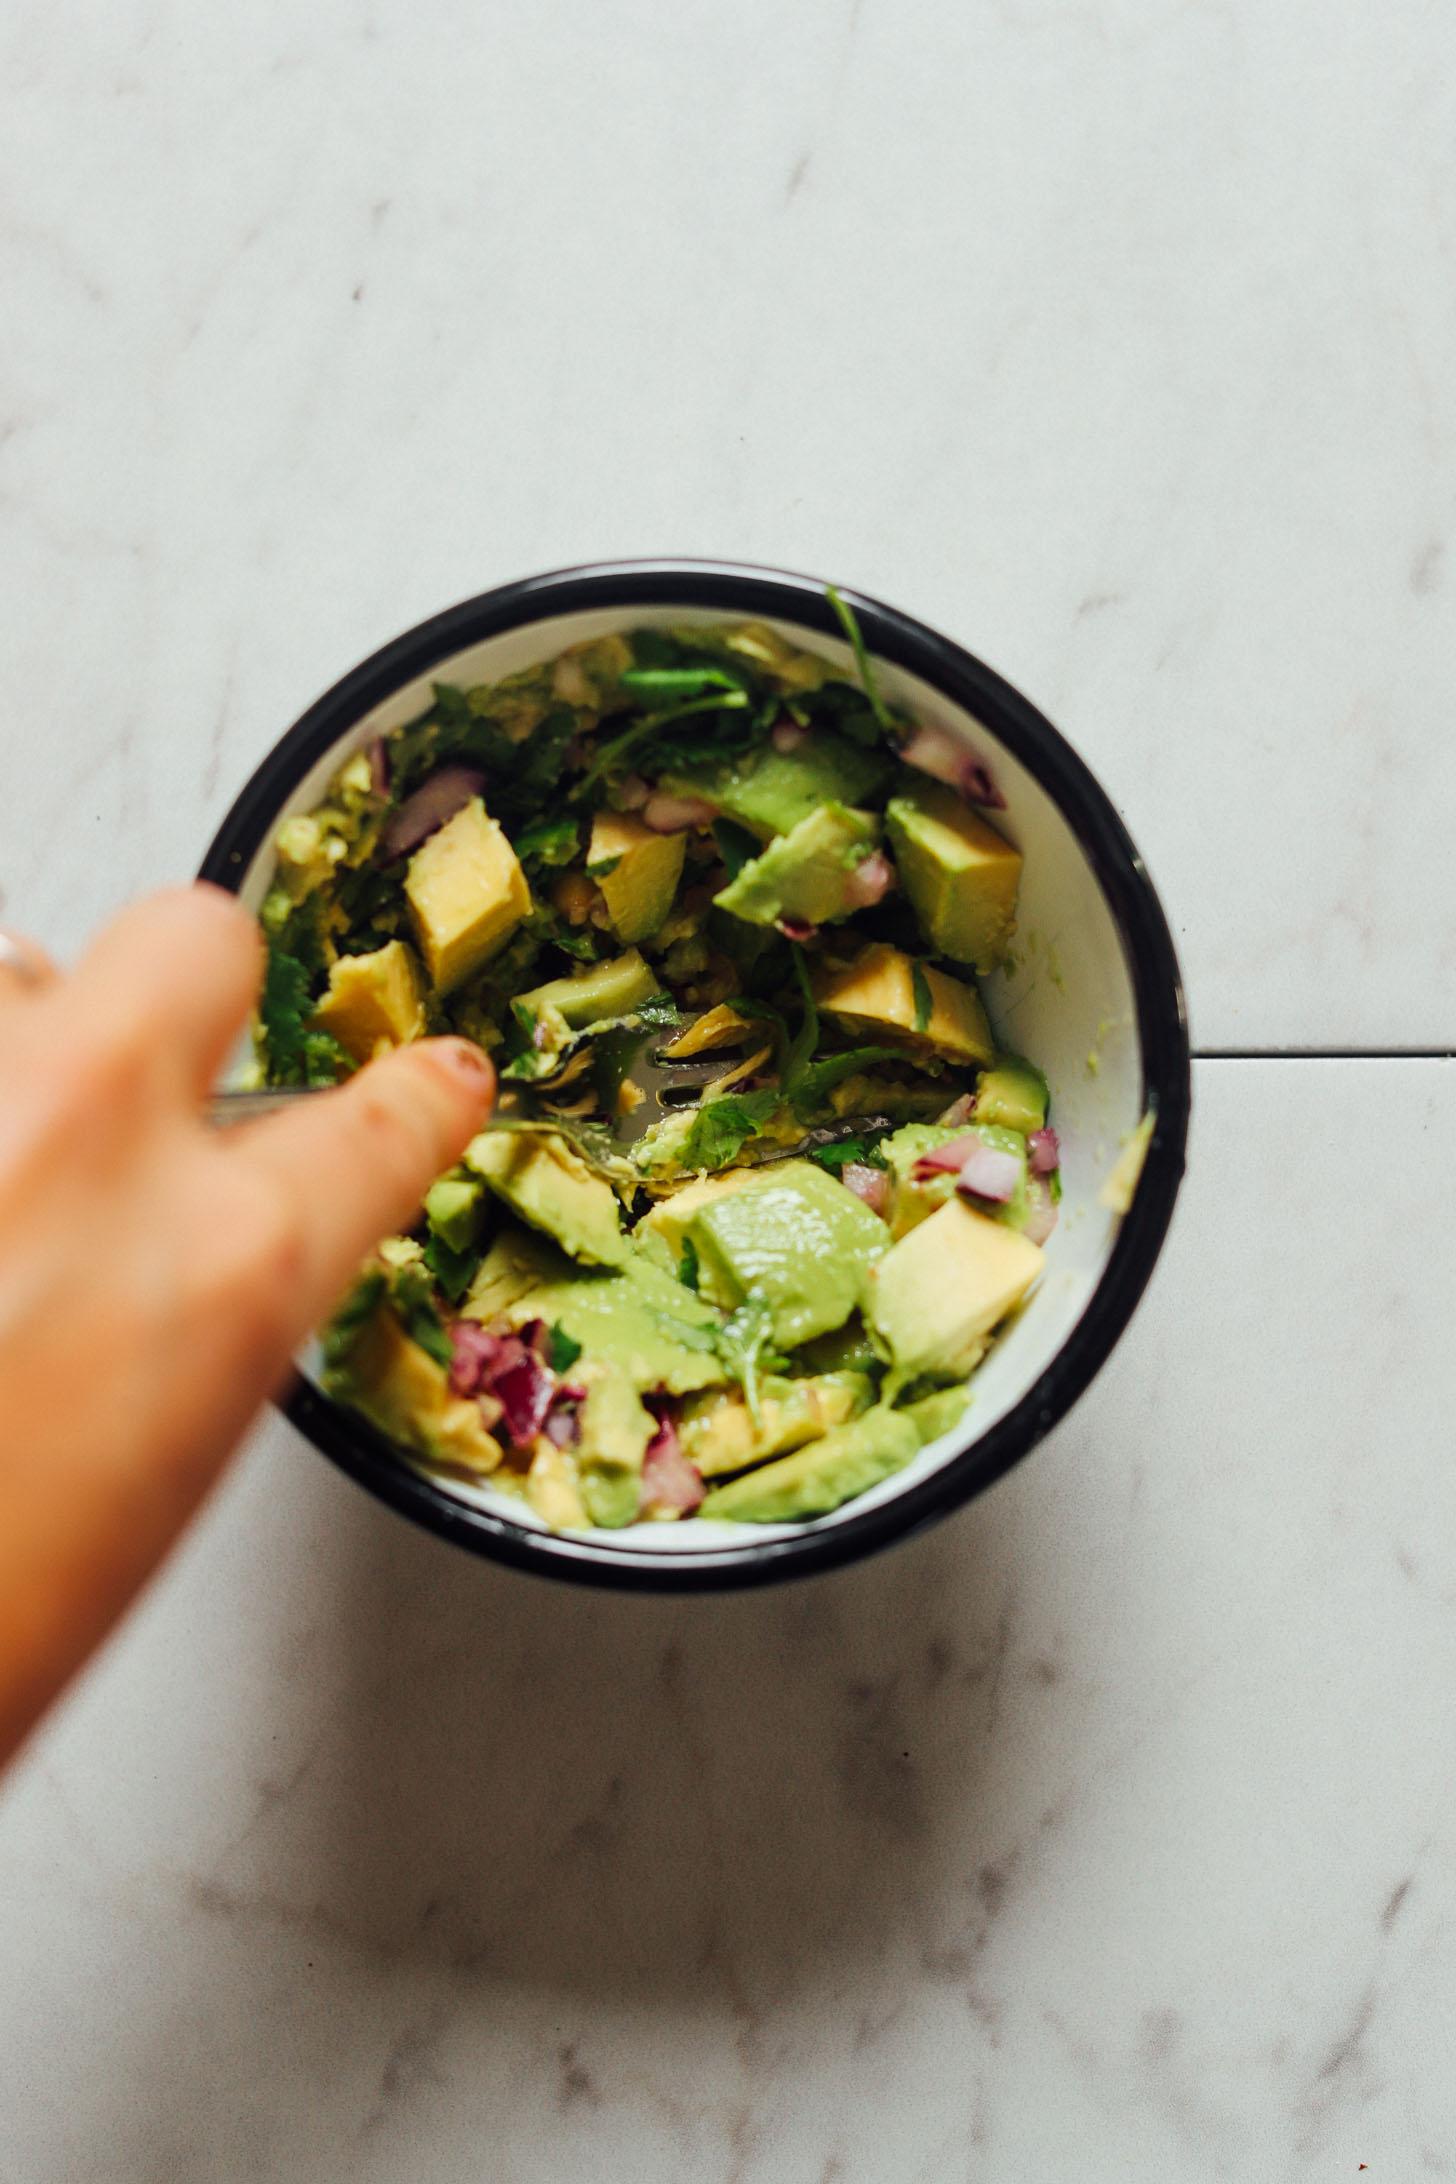 Using a fork to mash avocado for homemade vegan guacamole